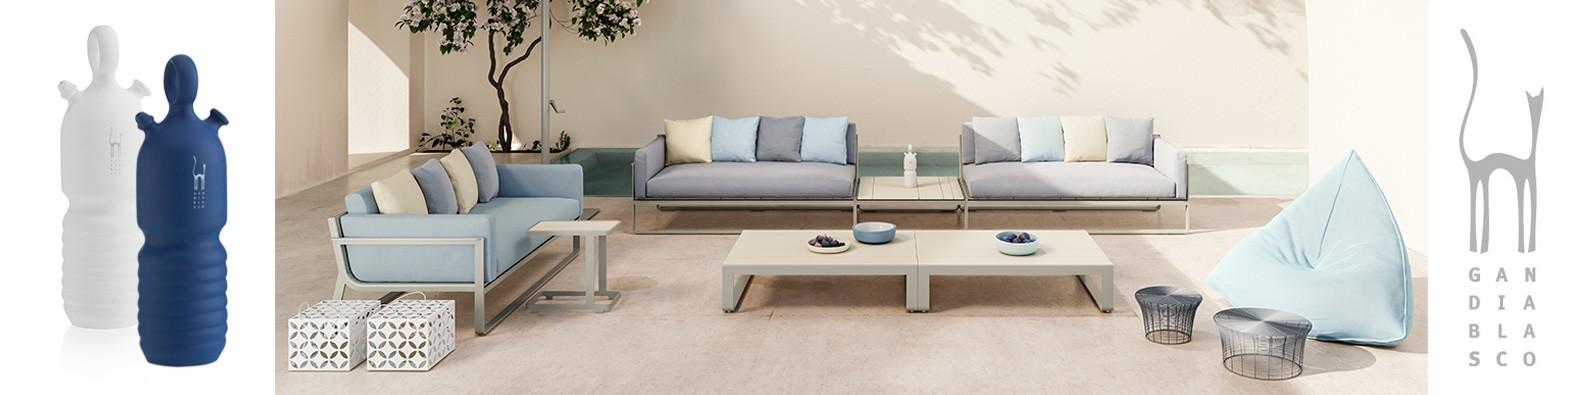 Muebles de exterior Gandía Blasco ¡Redescubre tus espacios de exterior!